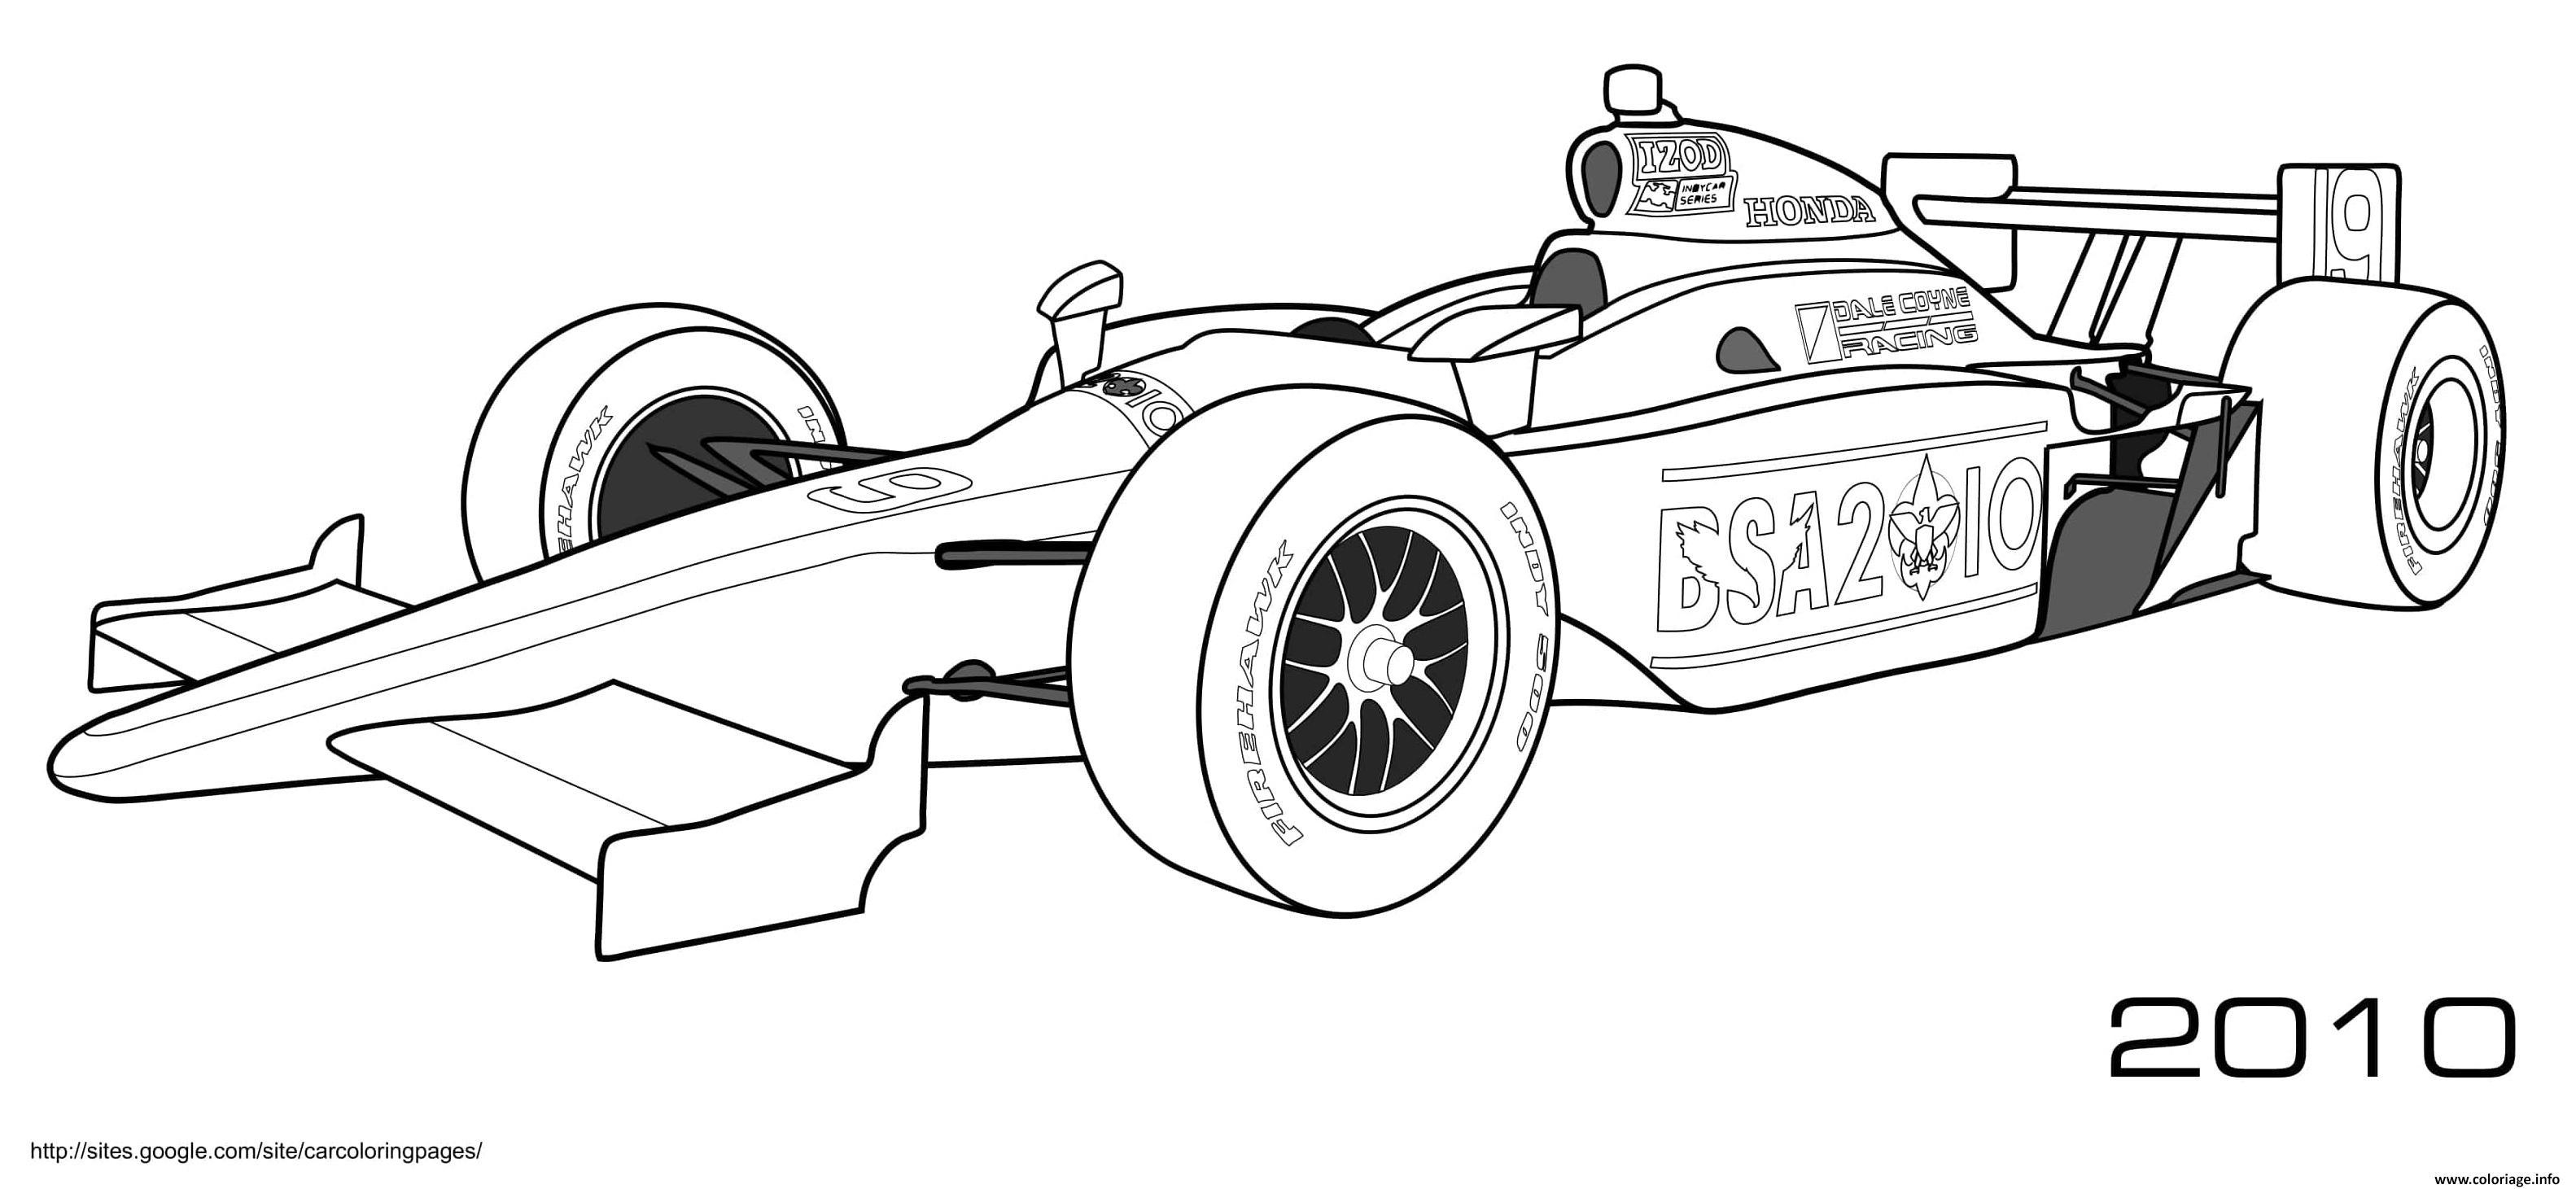 Dessin Formule 1 Honda Firehawk Izod Coloriage Gratuit à Imprimer